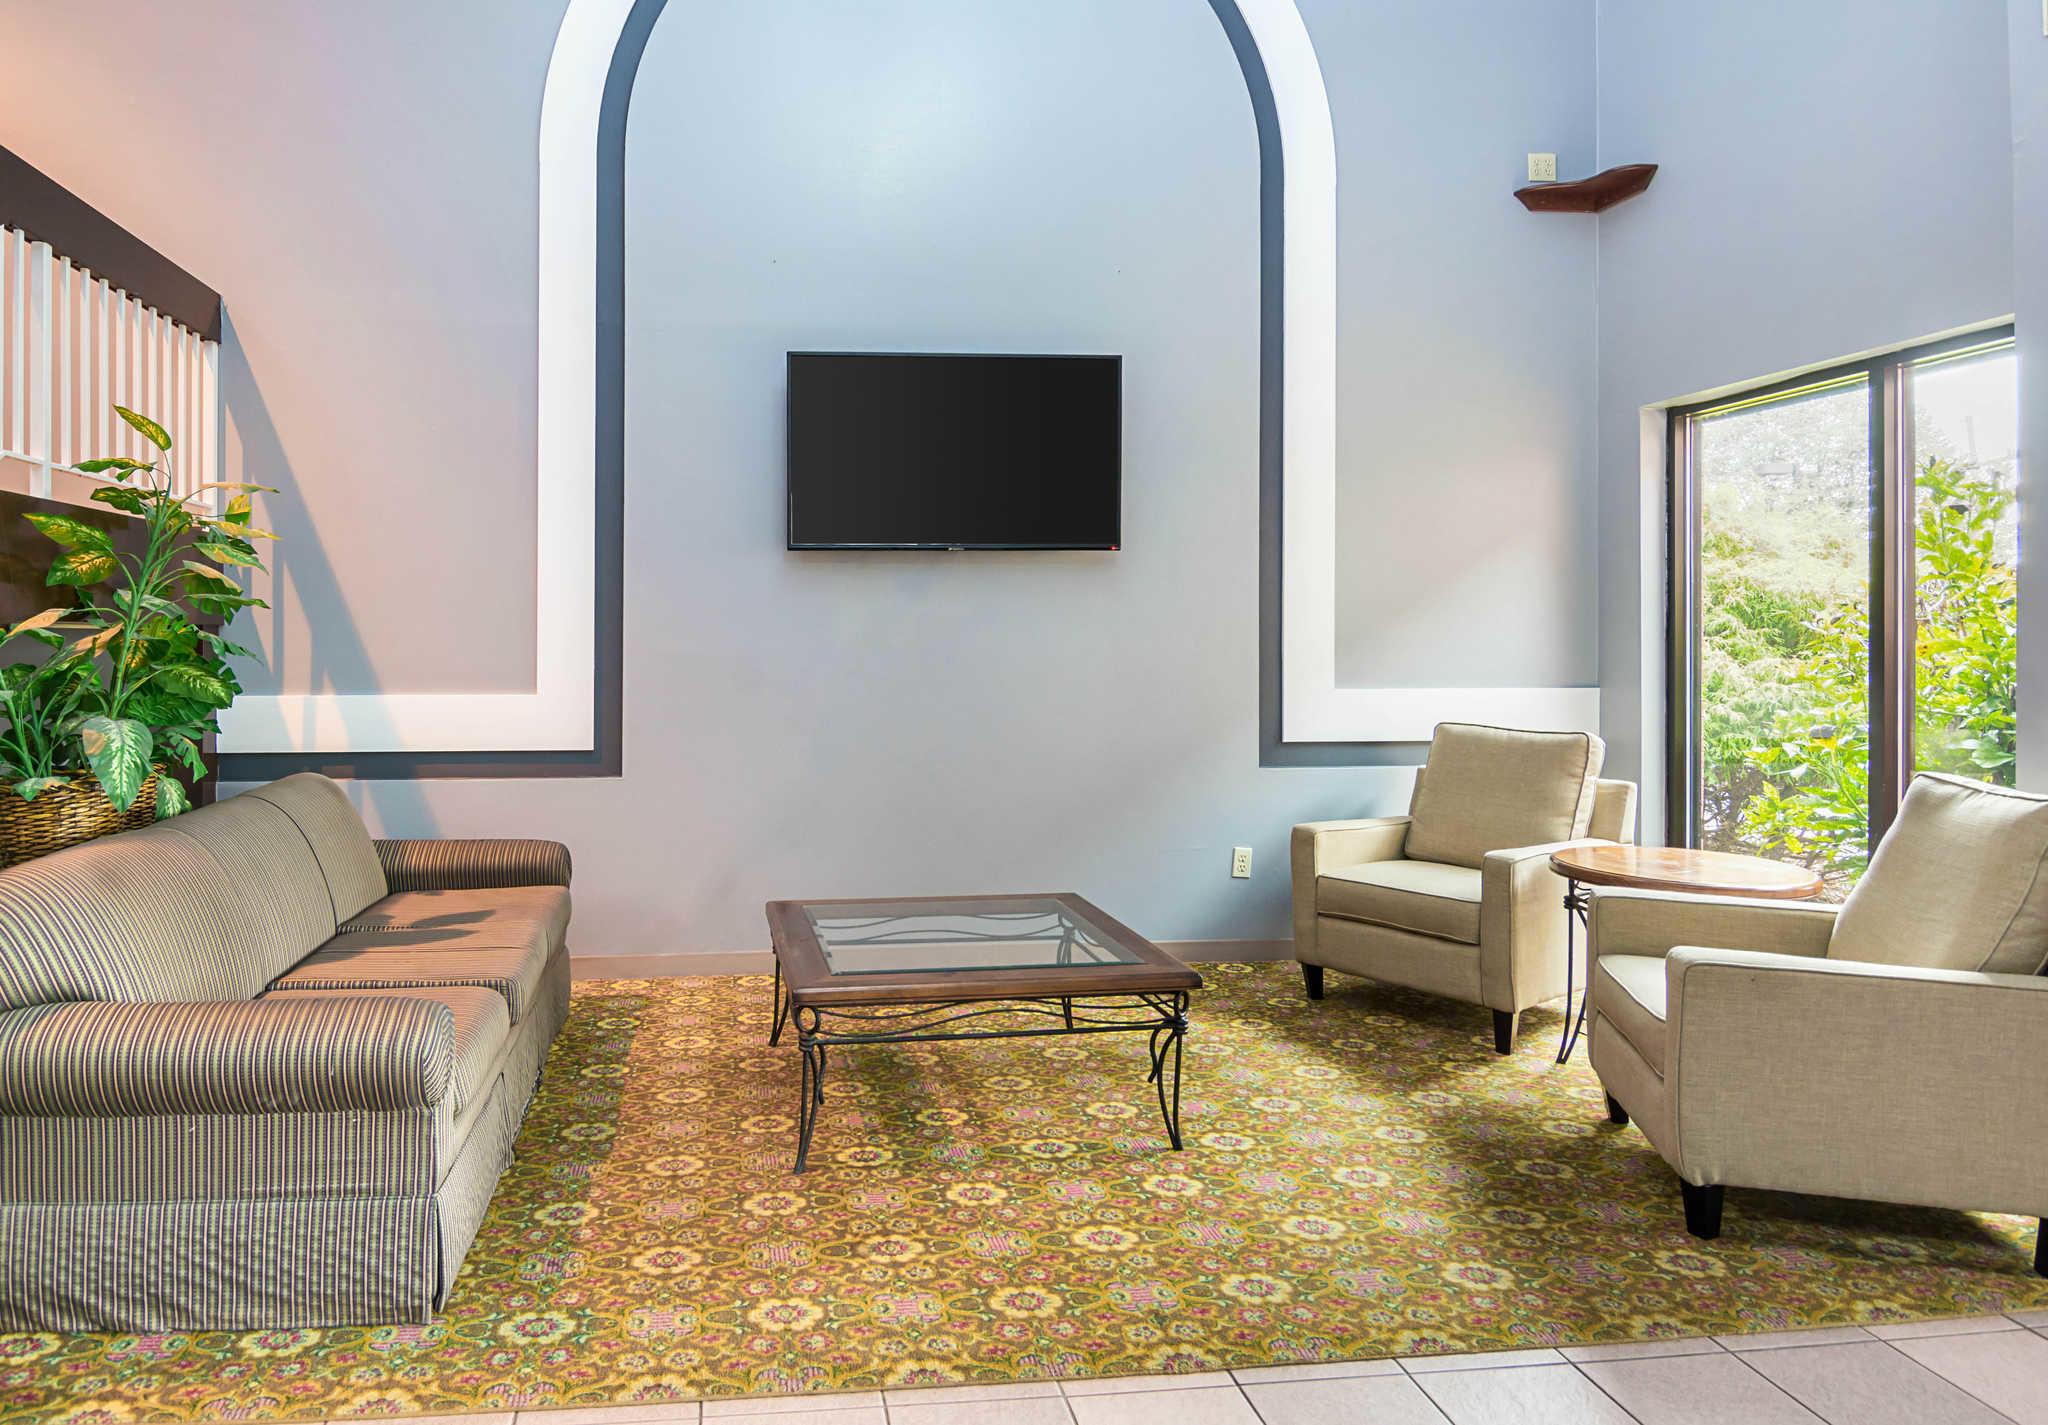 Quality Inn & Suites Kearneysville - Martinsburg image 6